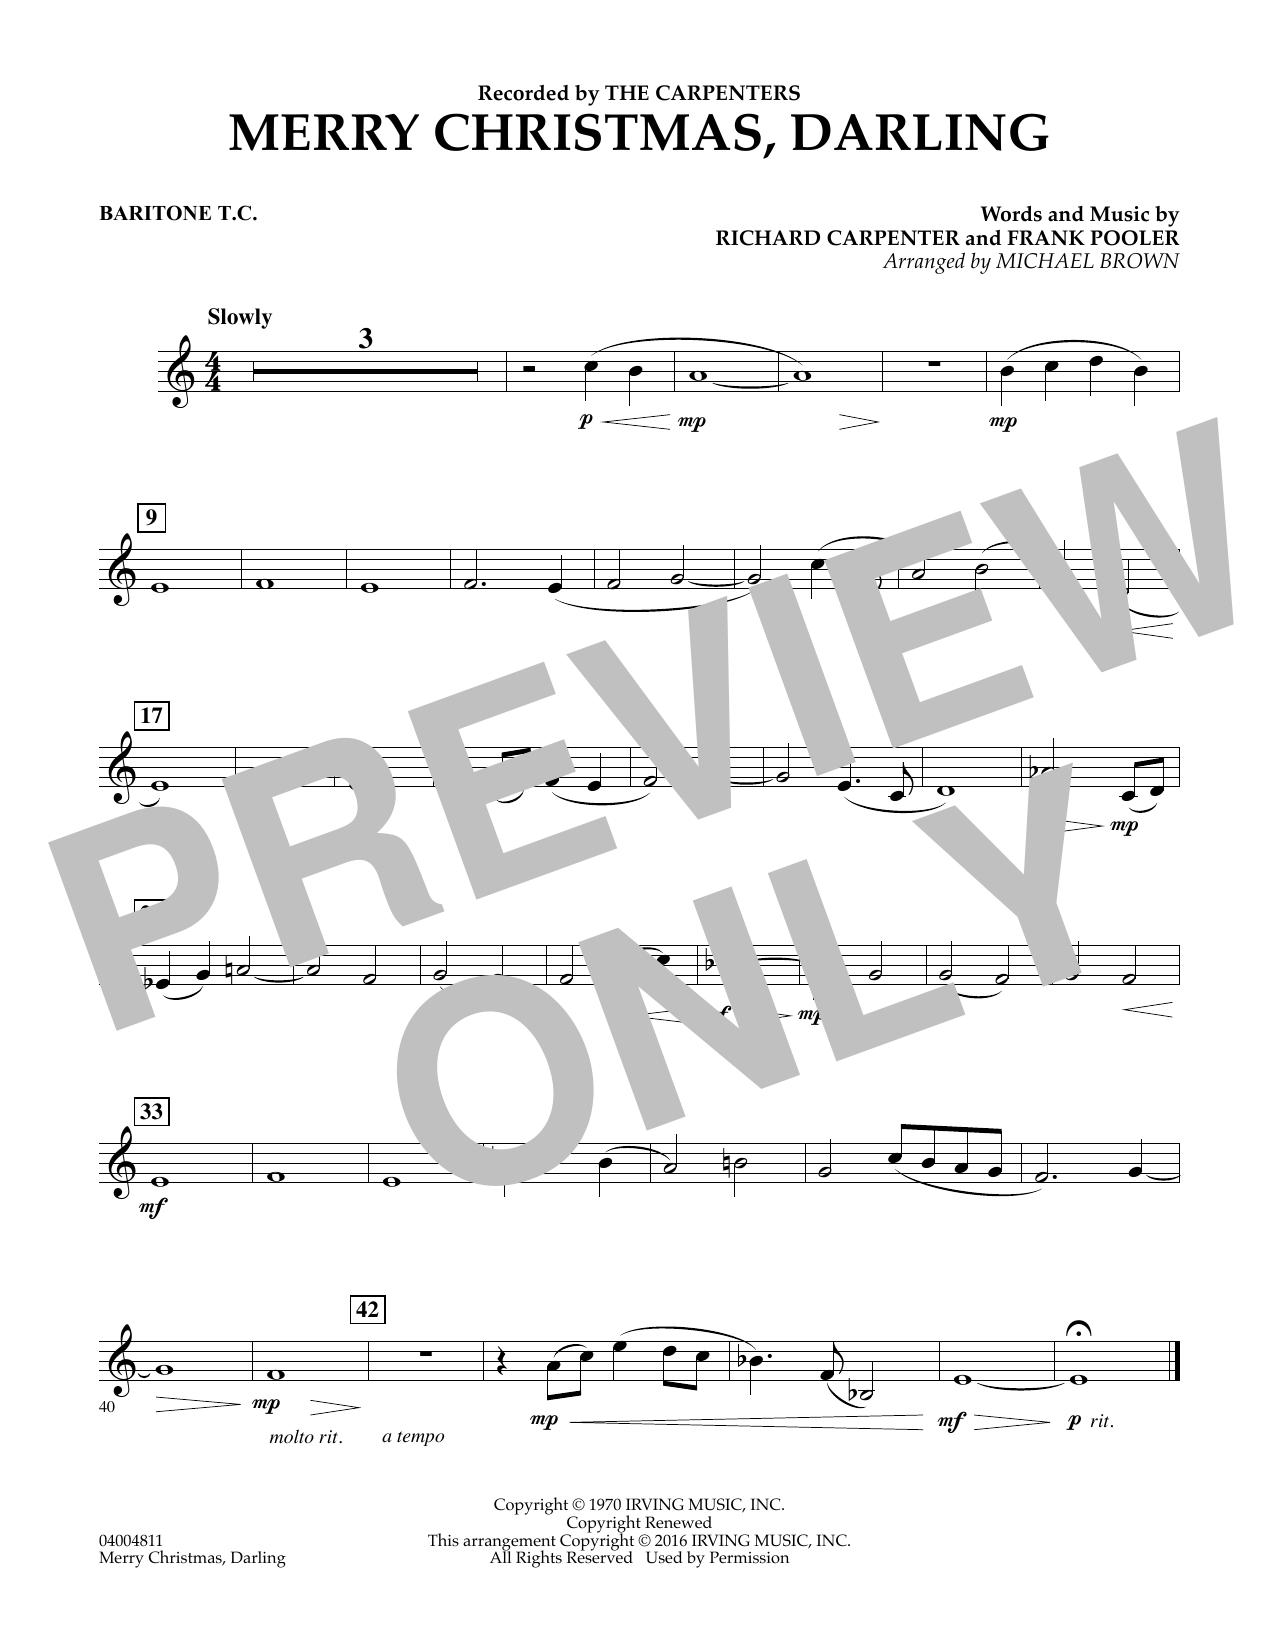 Merry Christmas, Darling - Baritone T.C. (Concert Band)